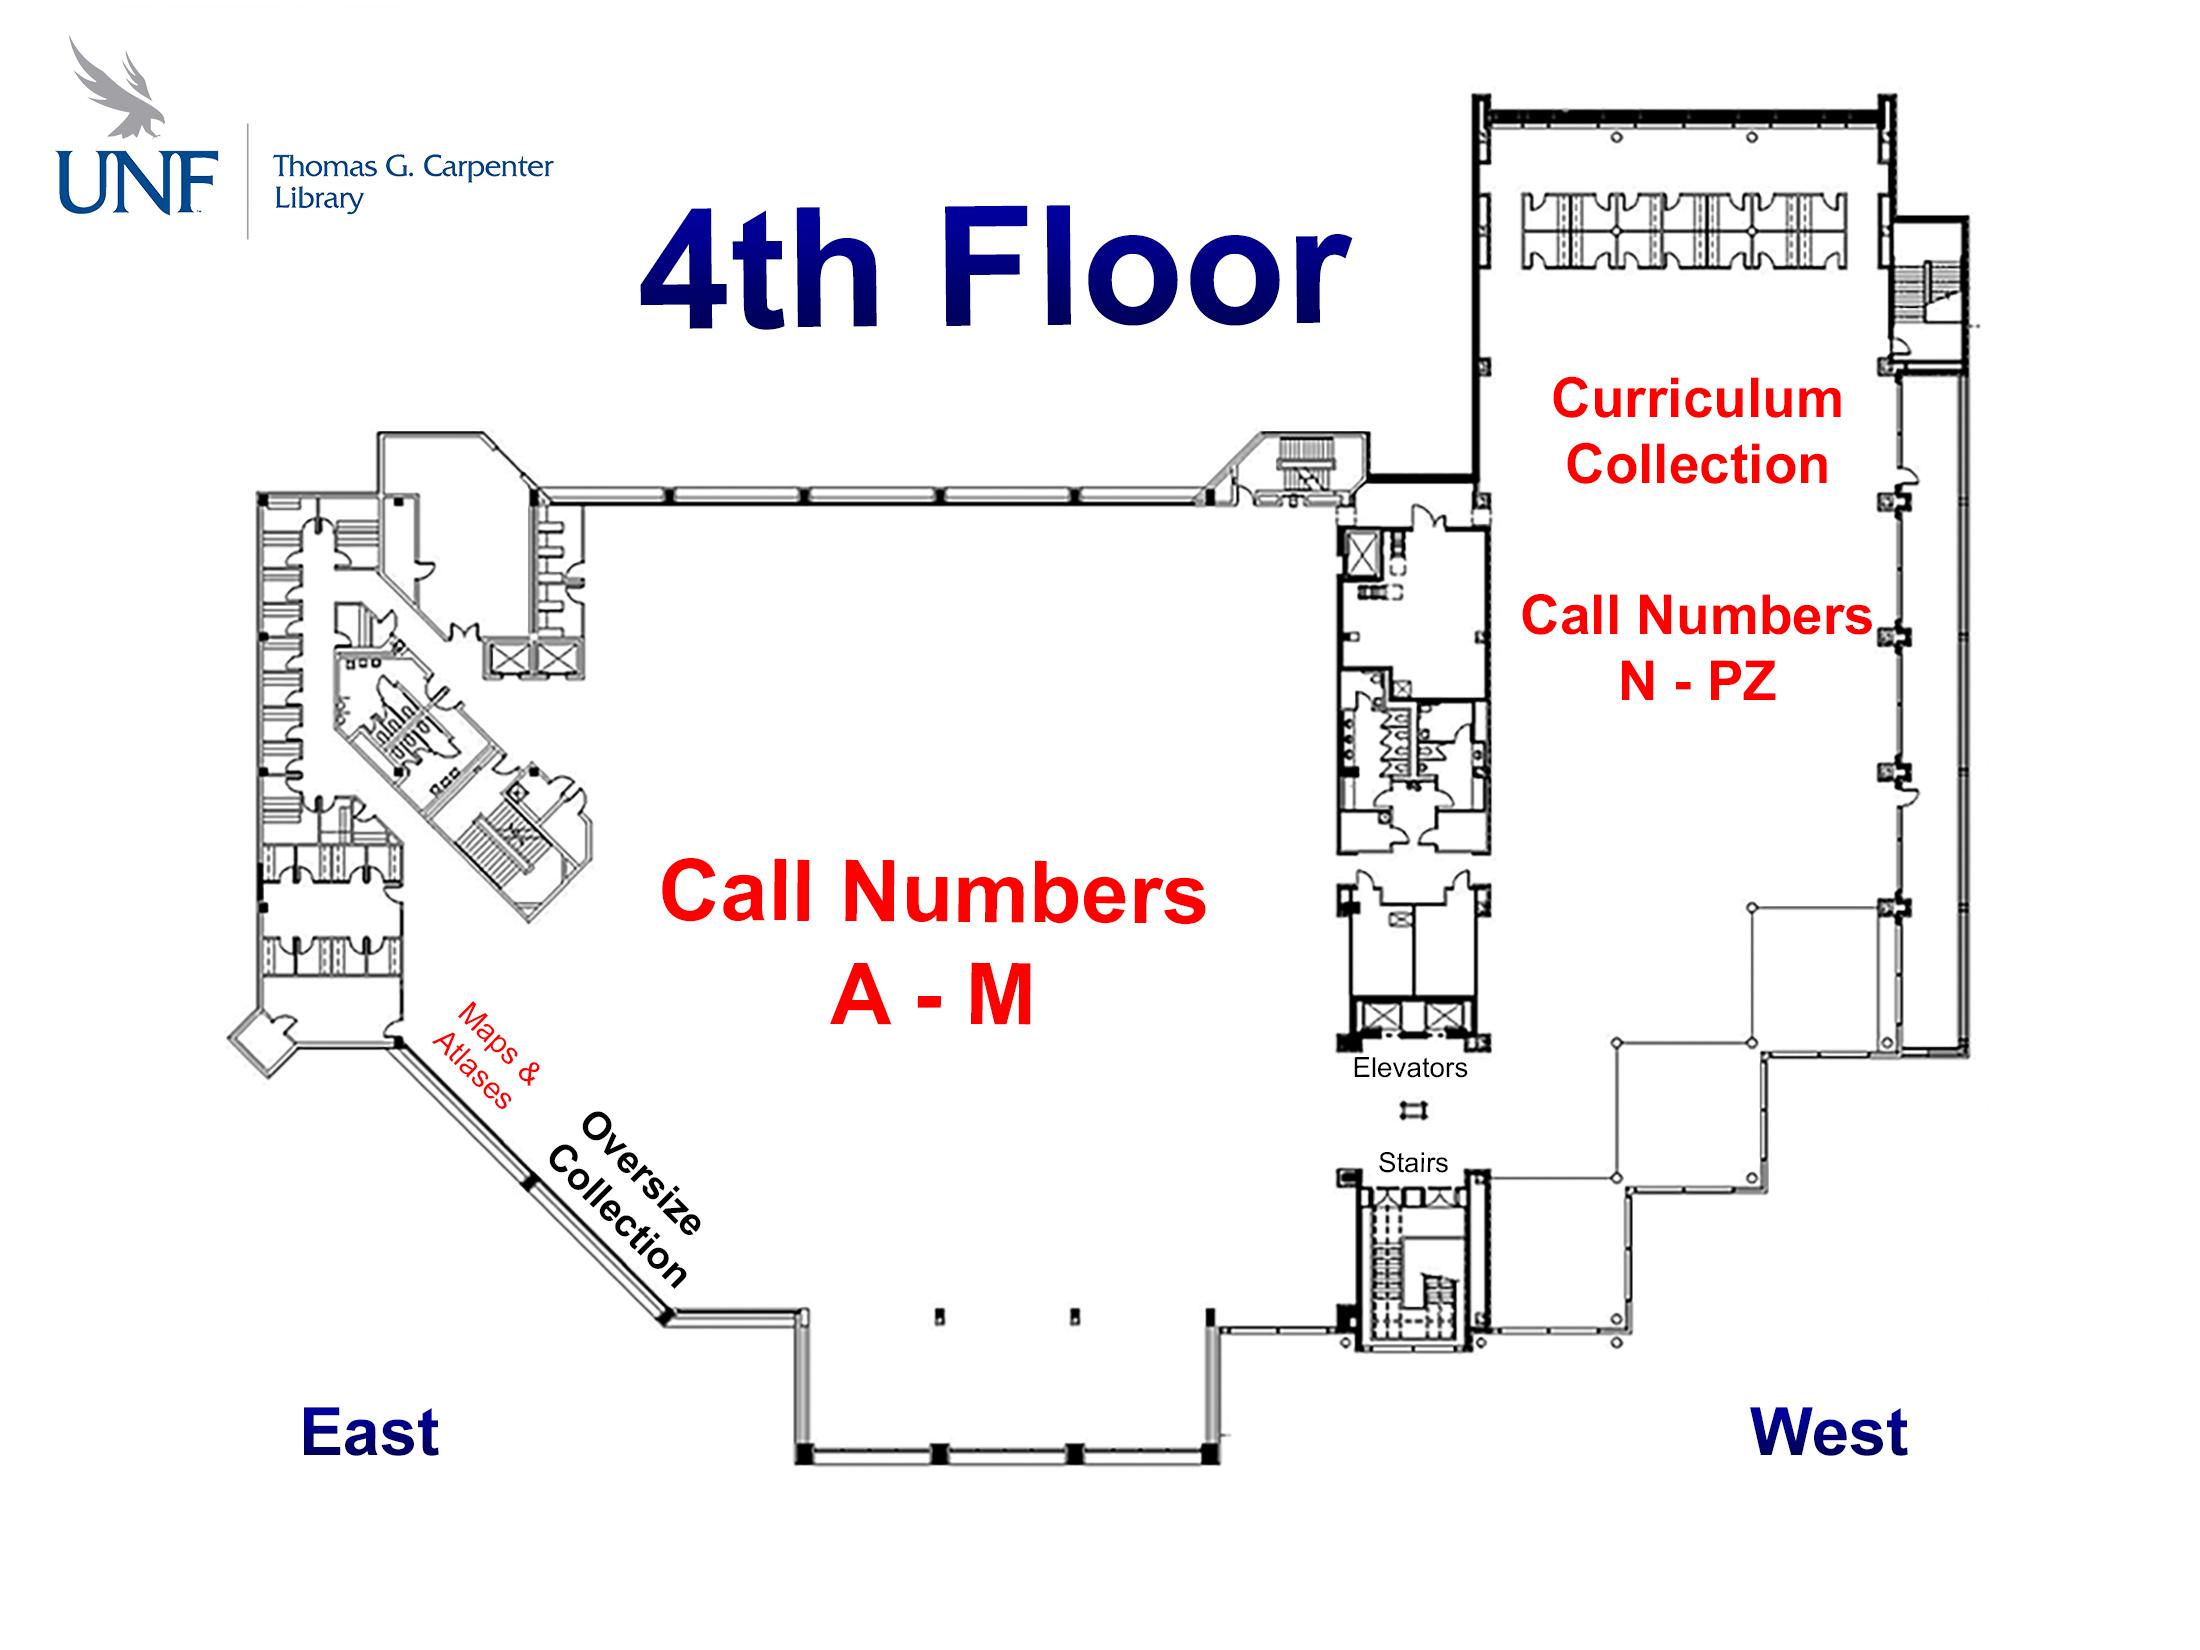 4th floor map